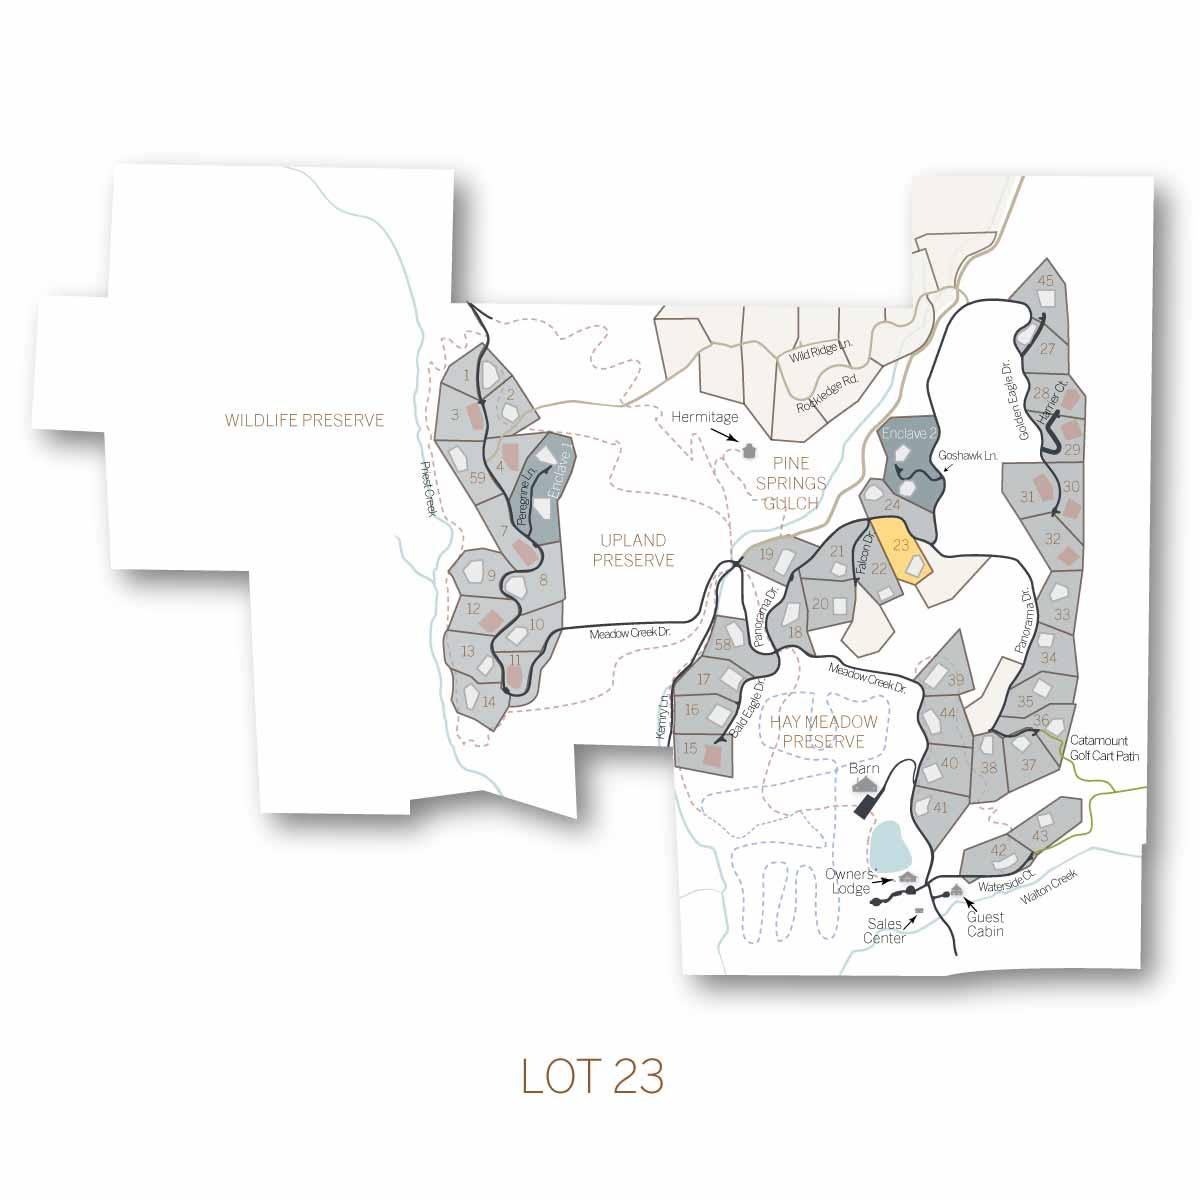 lot 23.1 - Homesite #23